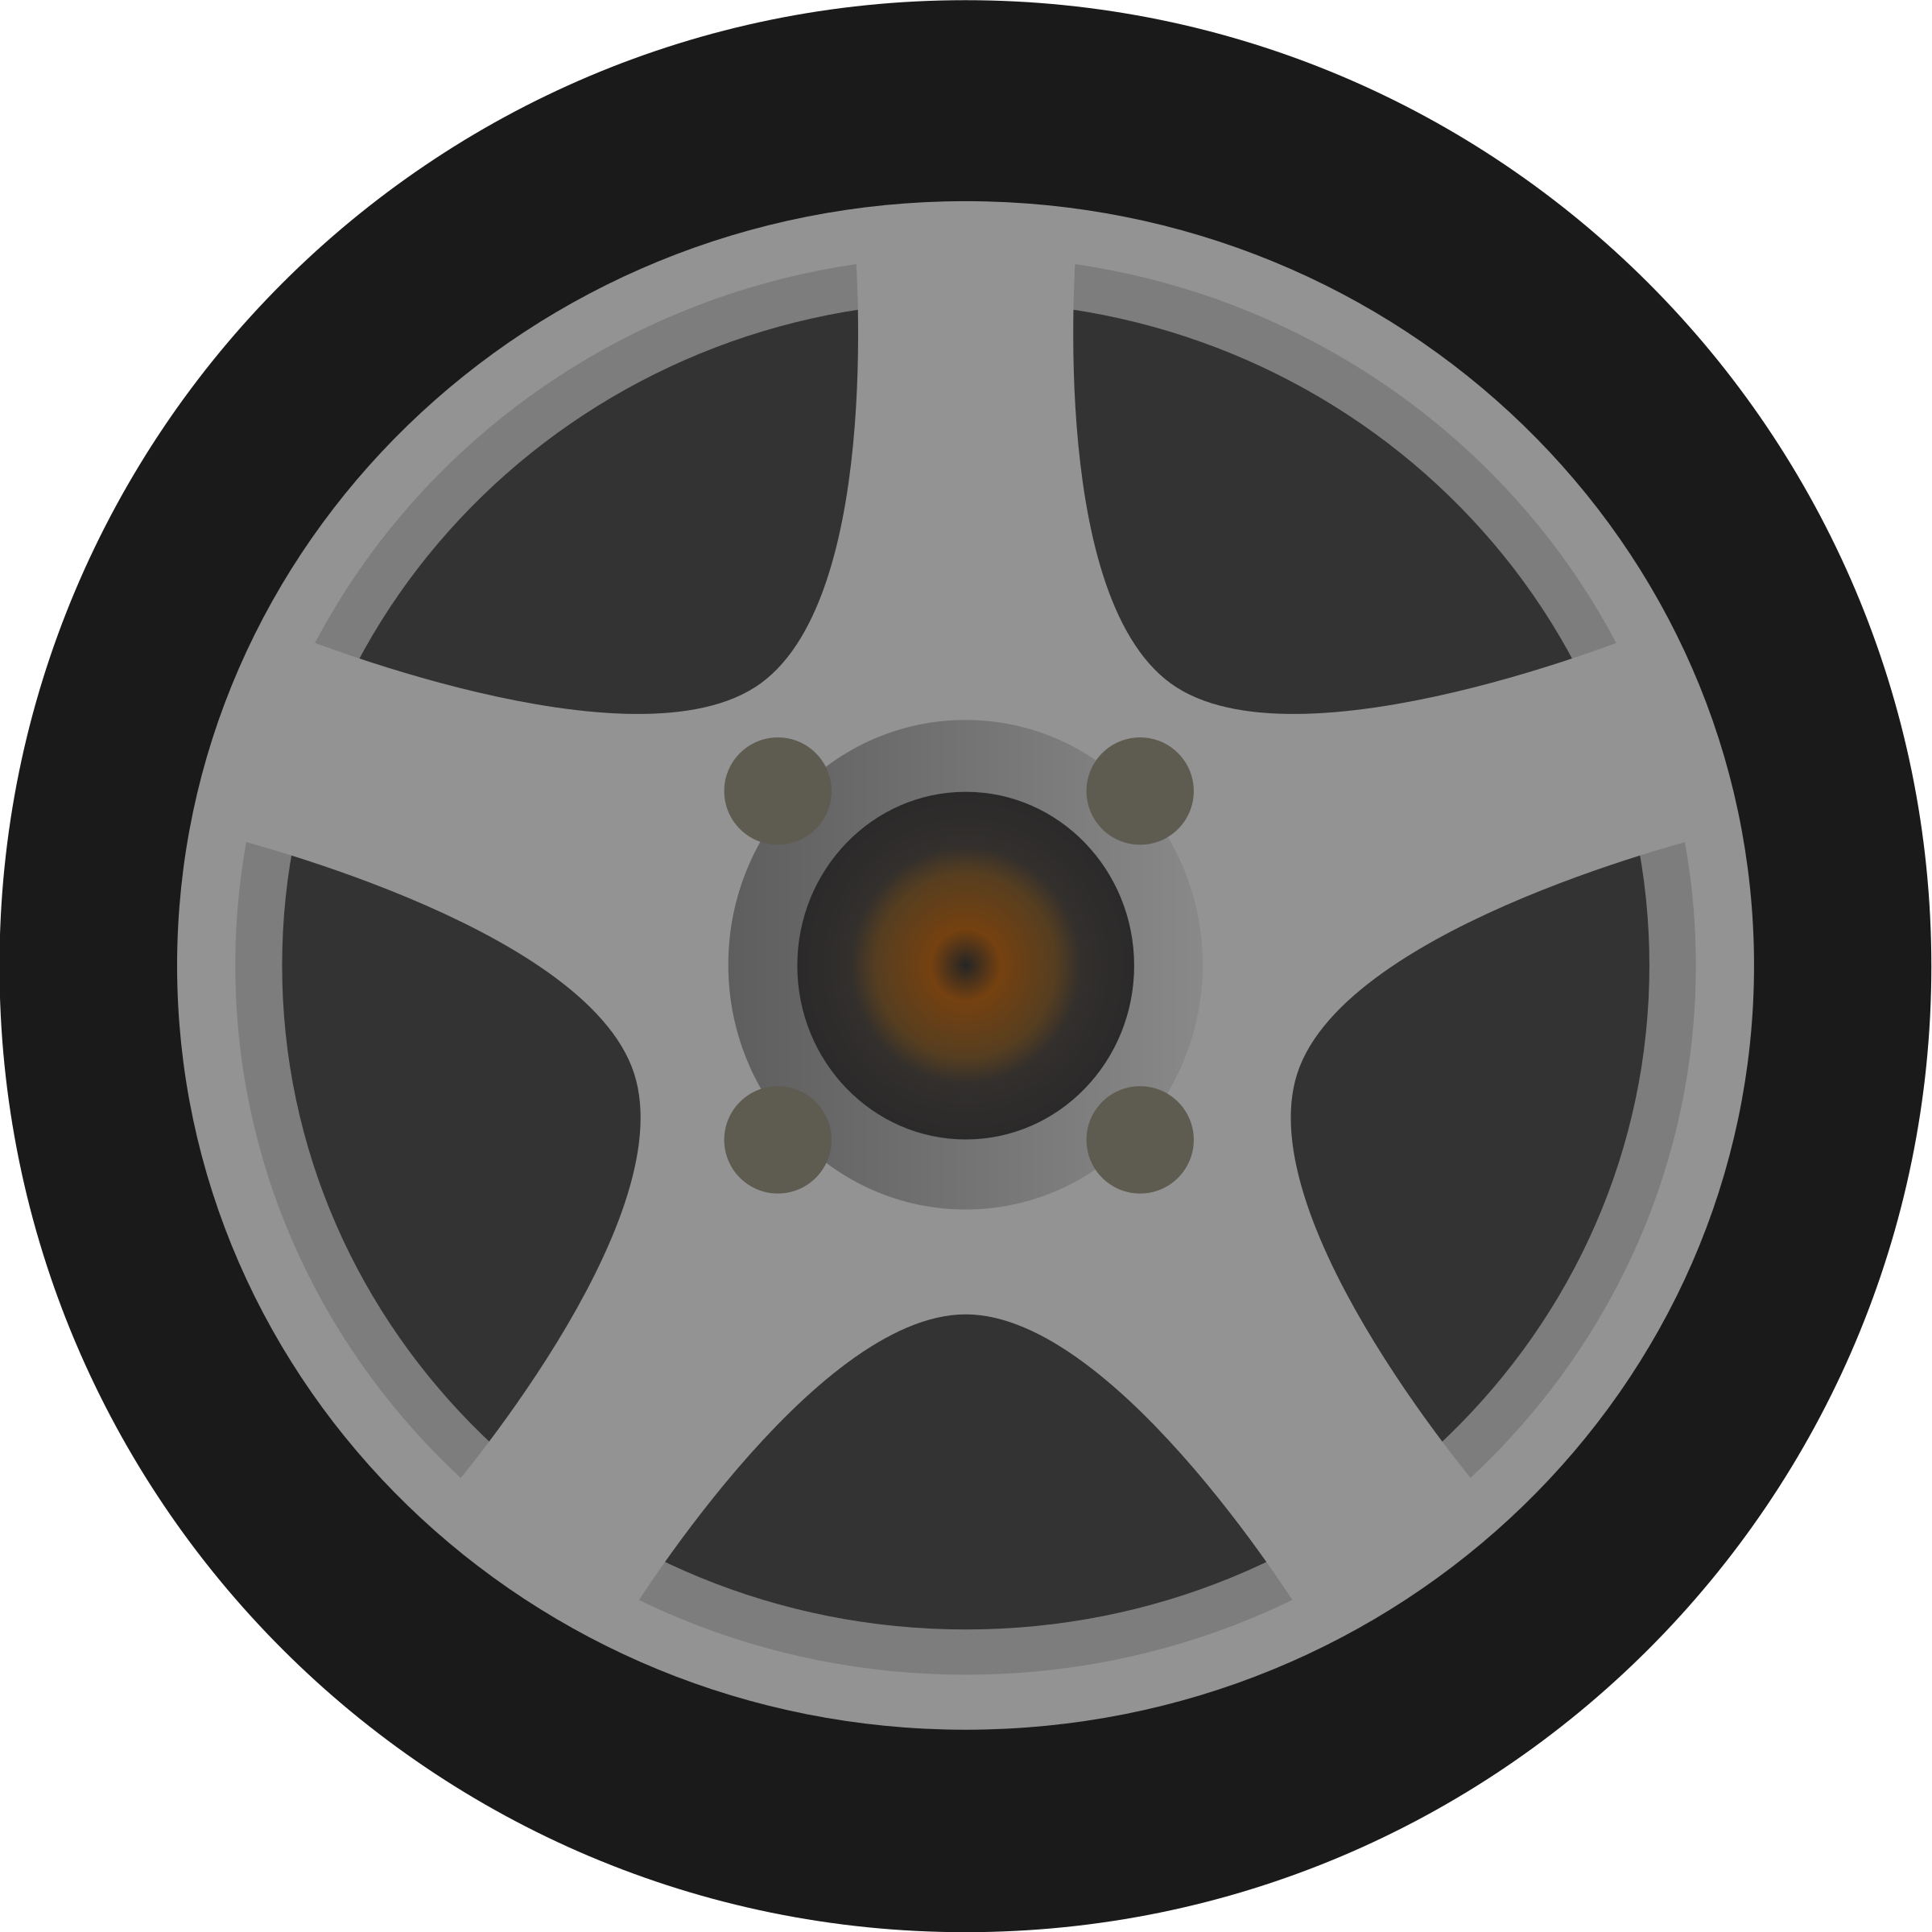 Simple car tire side. Wheel clipart transparent background